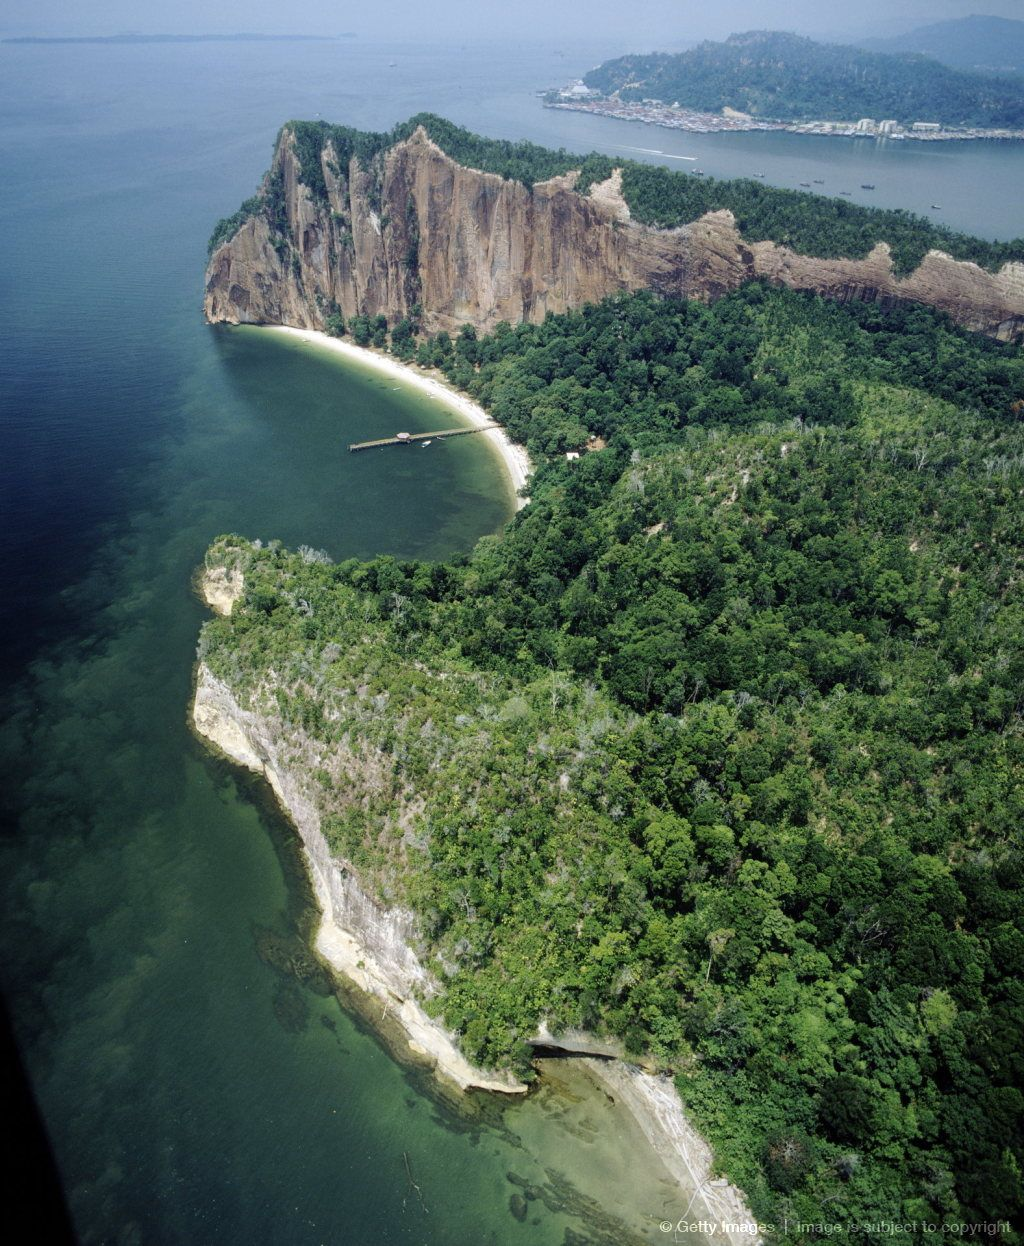 Borneo Island: Aerial View Of Sabah, Island Of Borneo, Malaysia